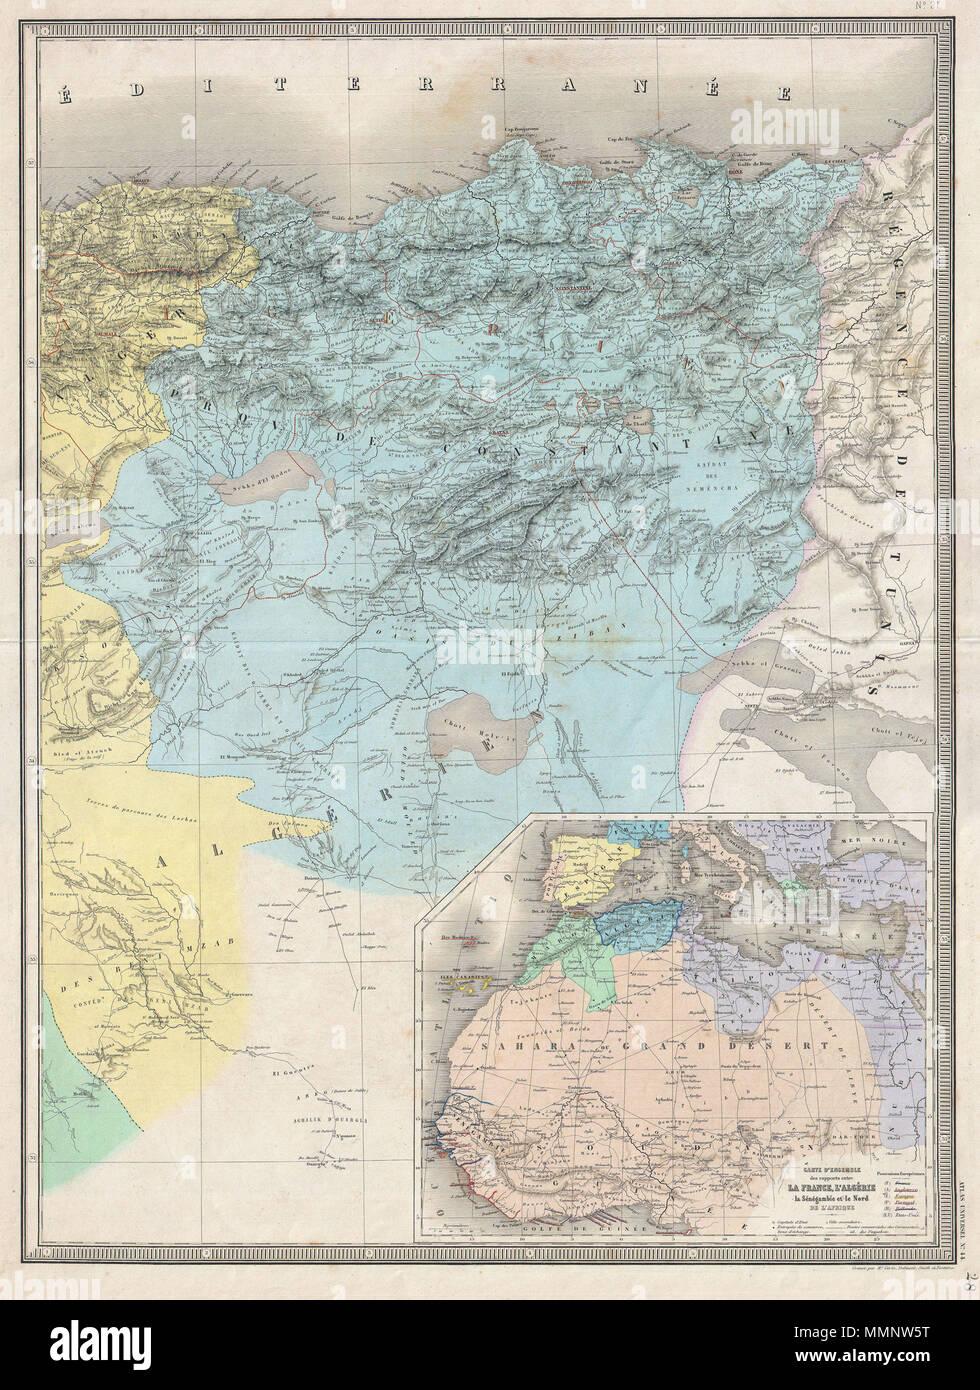 cartographer routes